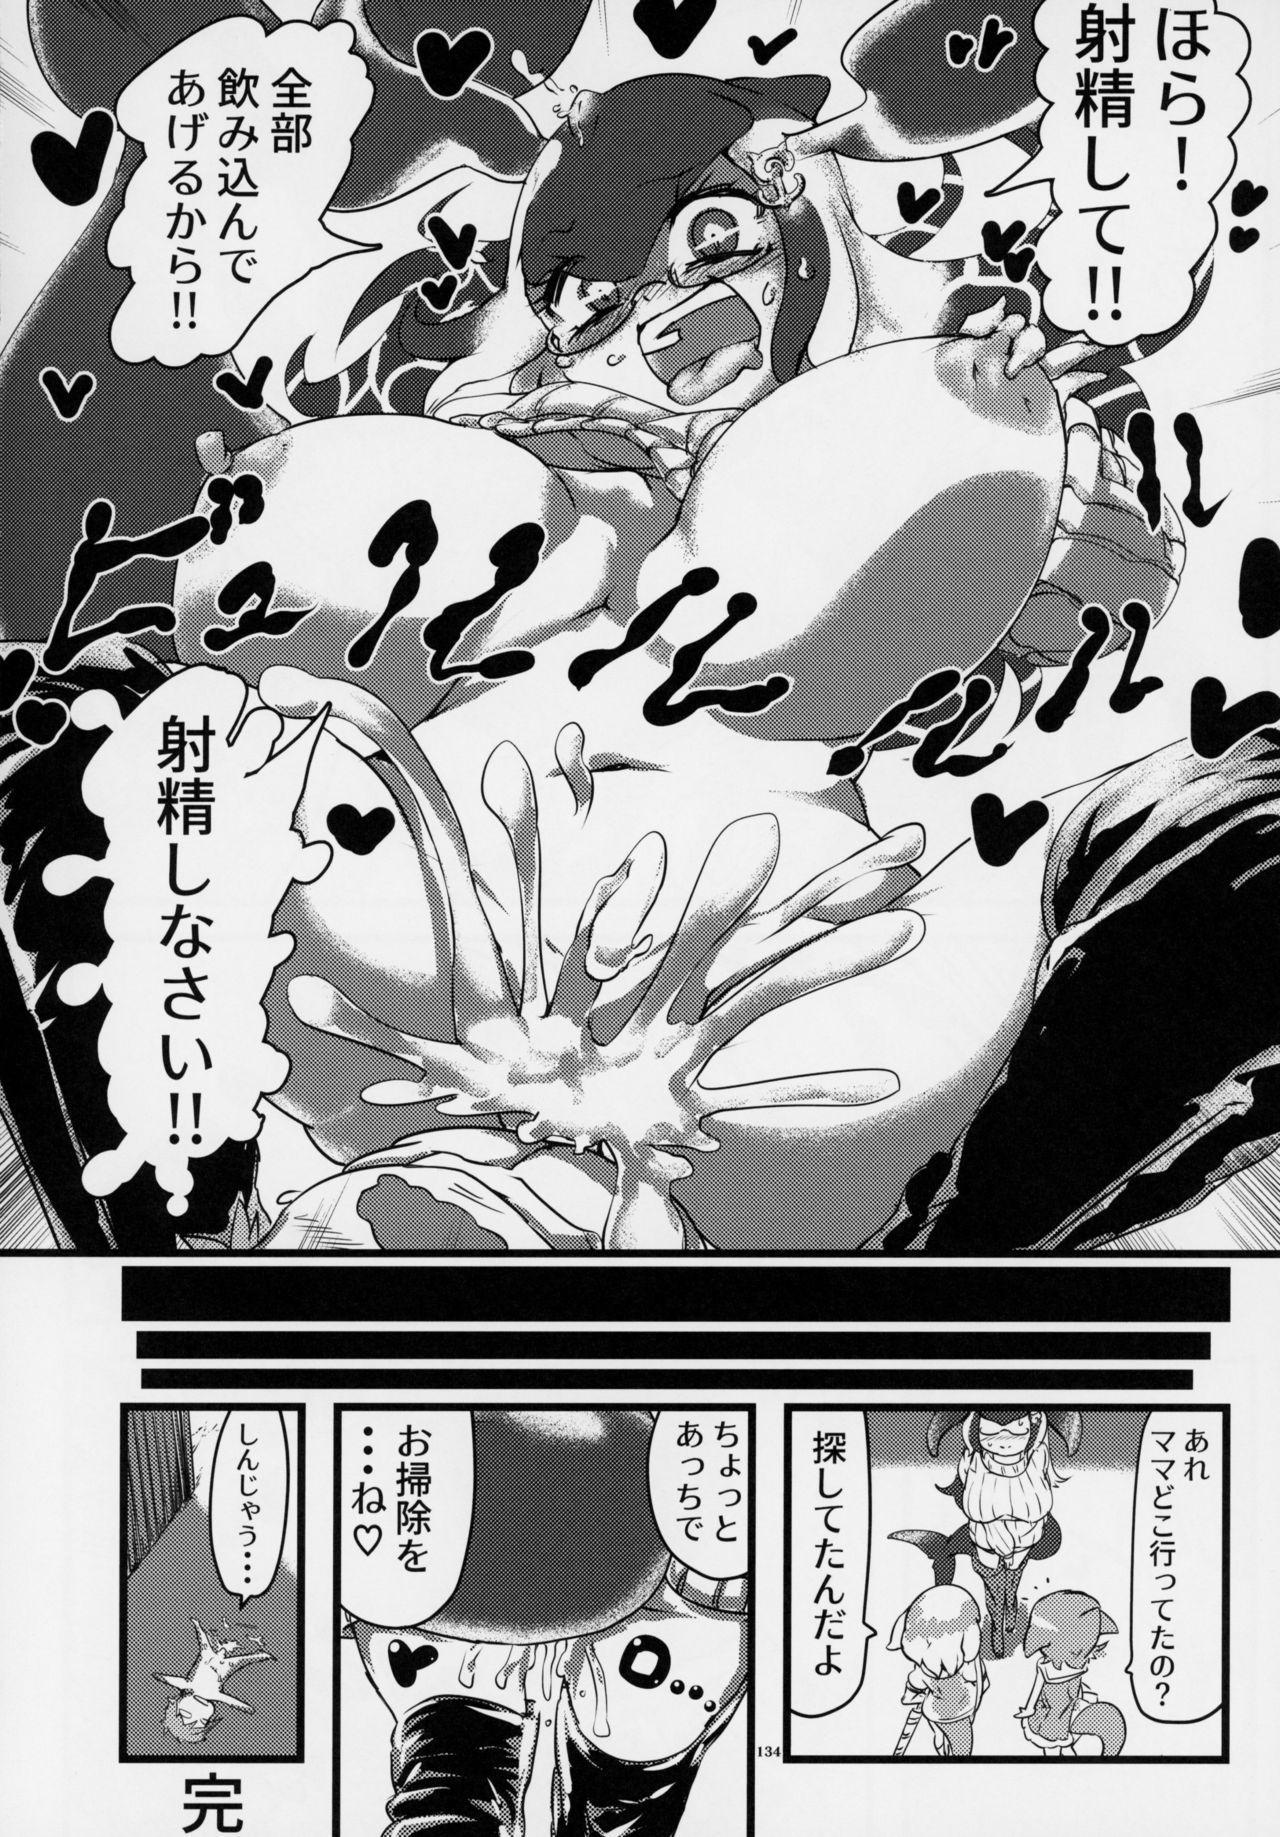 Friends Gyaku Rape Goudoushi 132